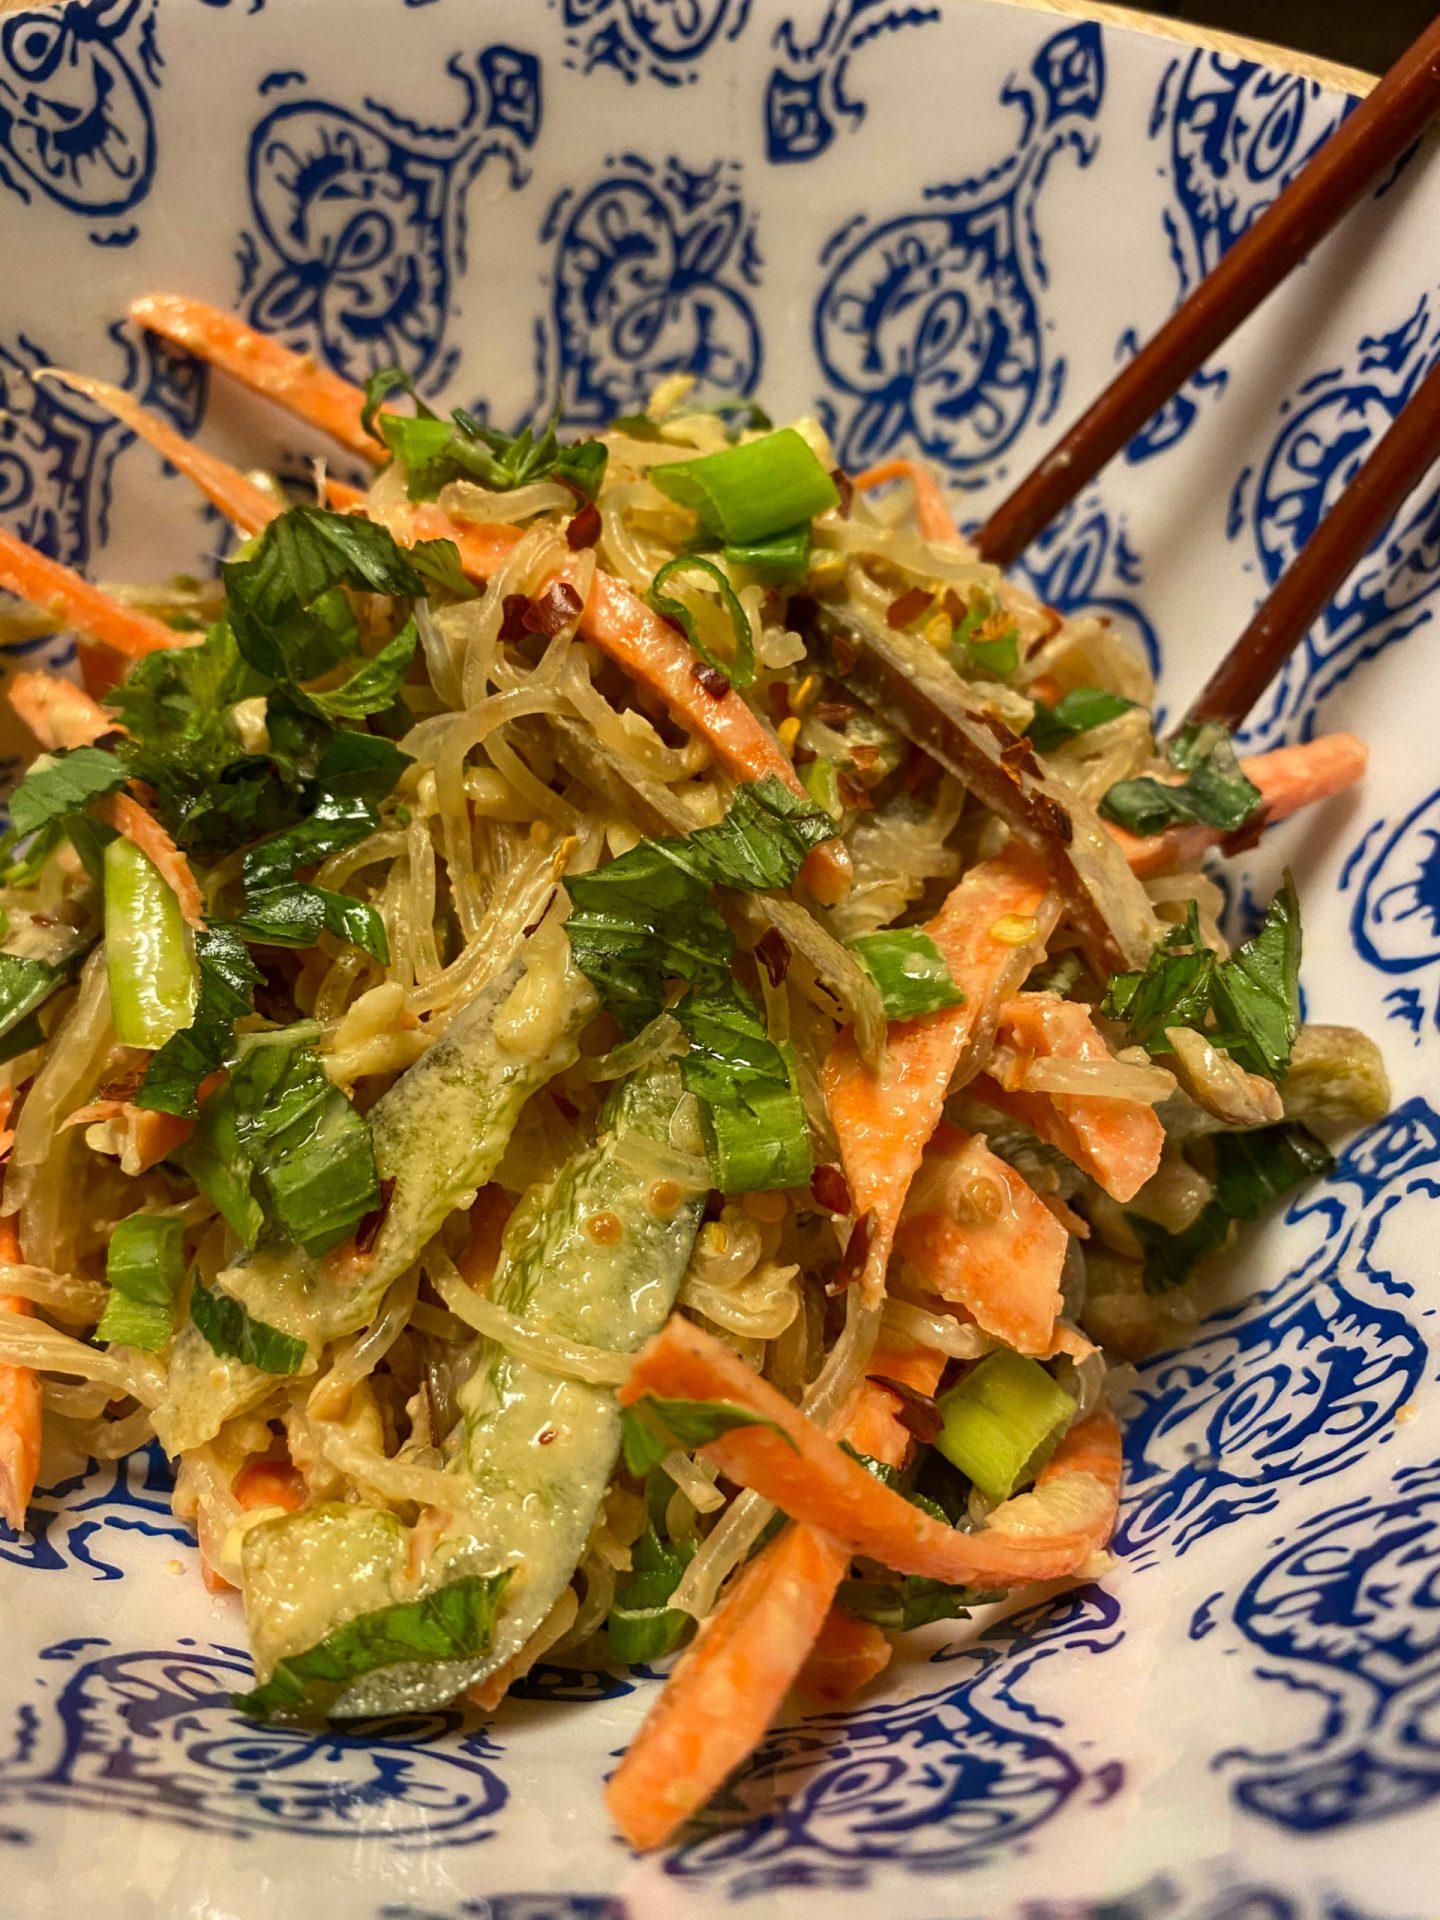 Raw vegan pad thai in a wooden bowl